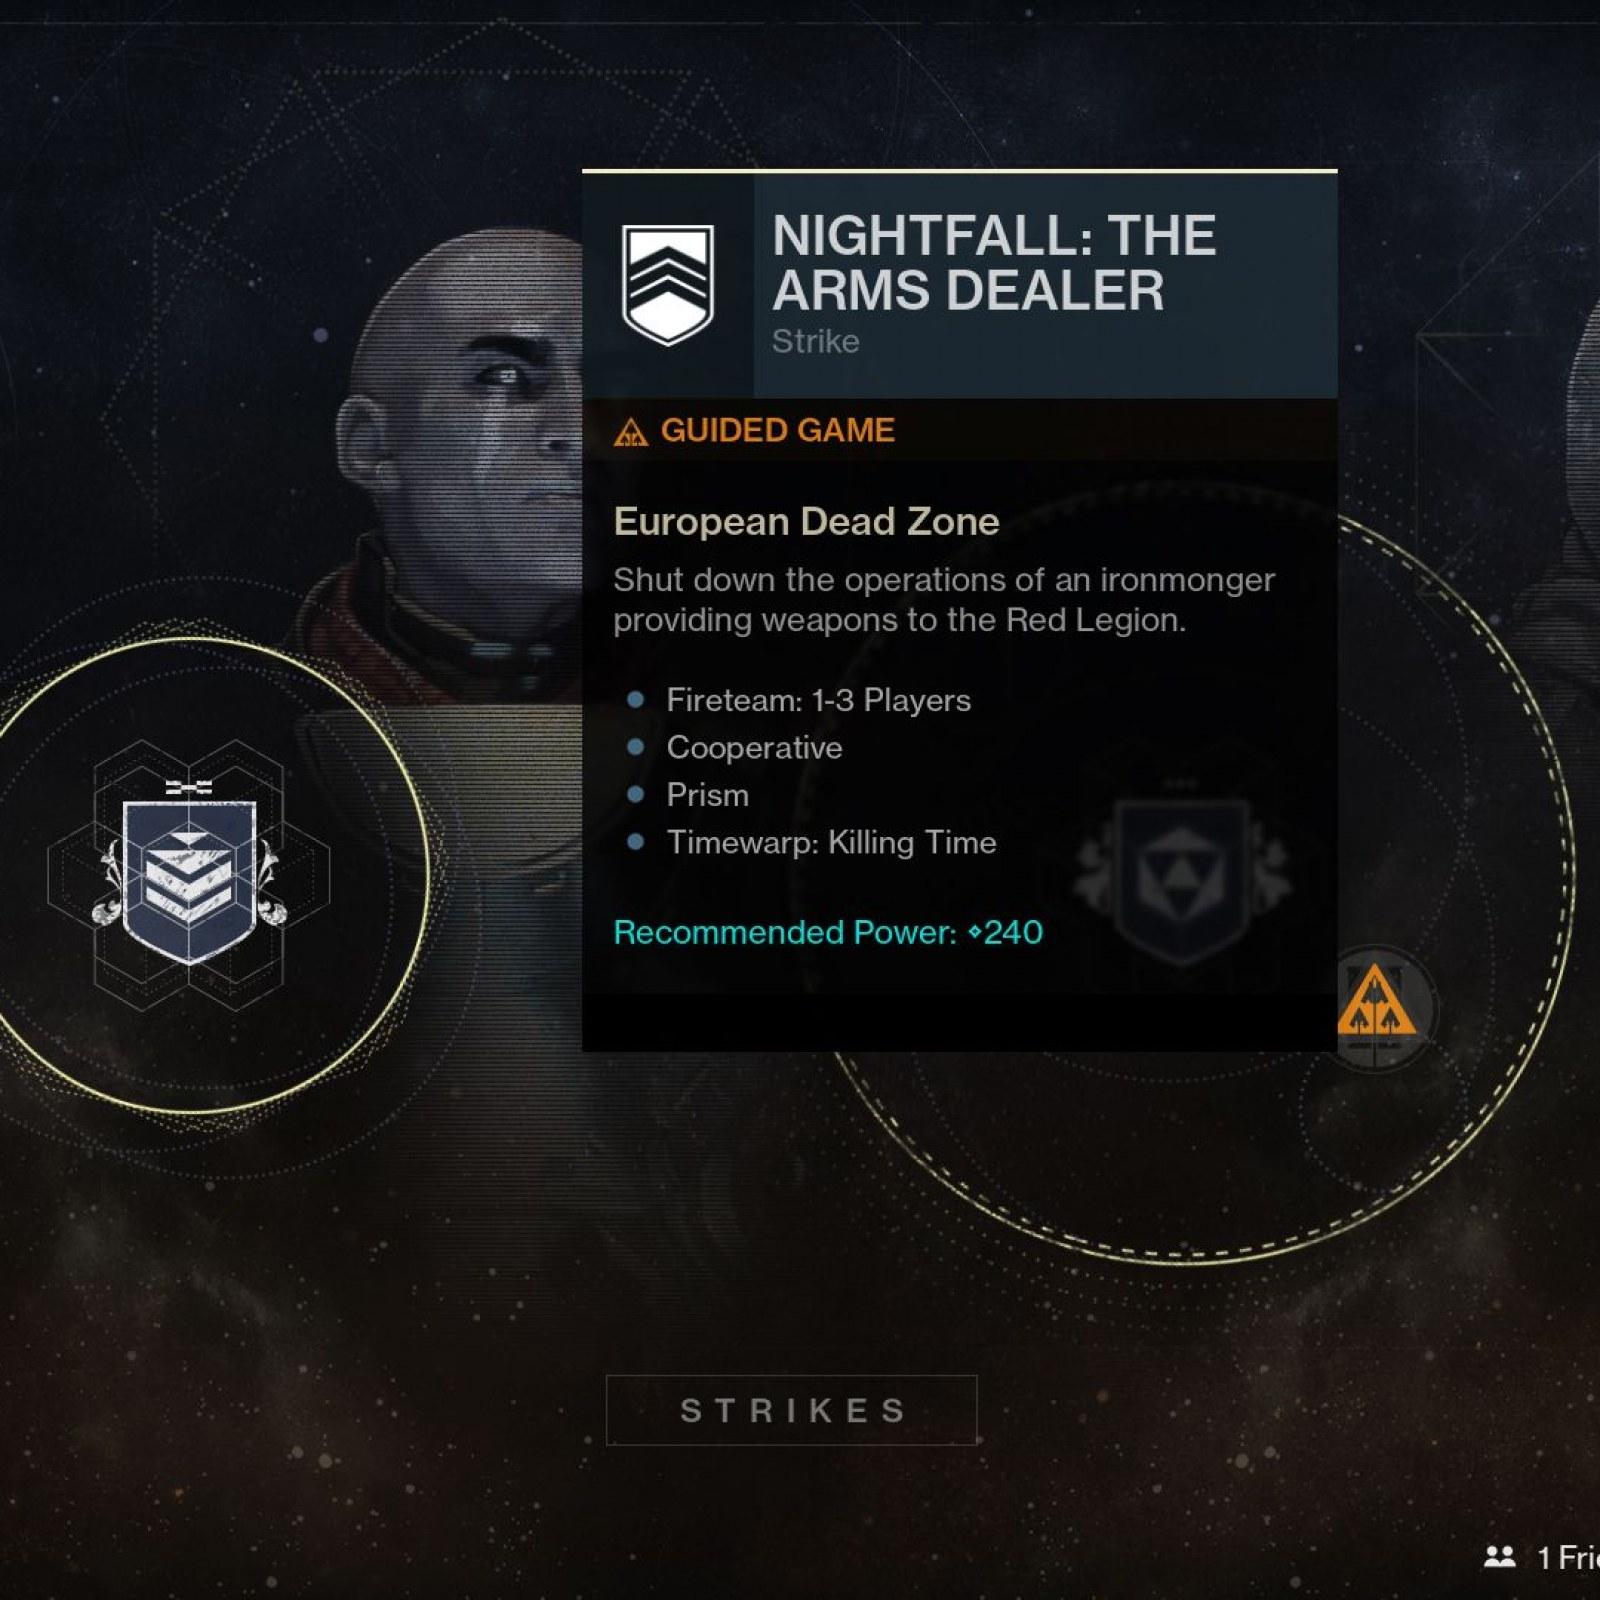 Destiny 2 Update 1 15 (1 1 3) Adds Nightfall Scoring - Patch